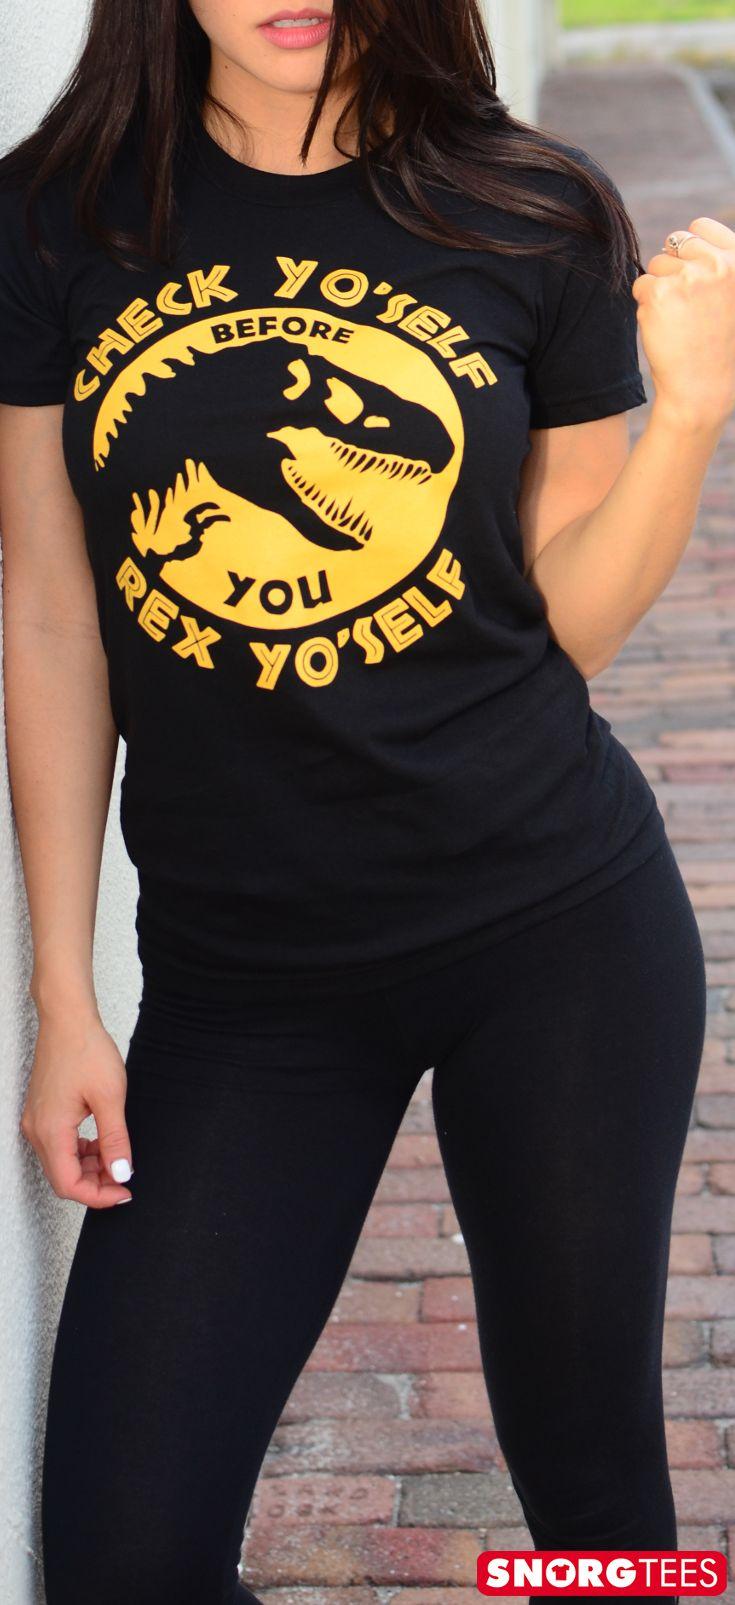 "Funny, clever t-shirts and hoodies for men and women. ""Check Yo'Self Before You Rex Yo'Self"" shirt. Black and yellow dinosaur shirt. | SnorgTees"